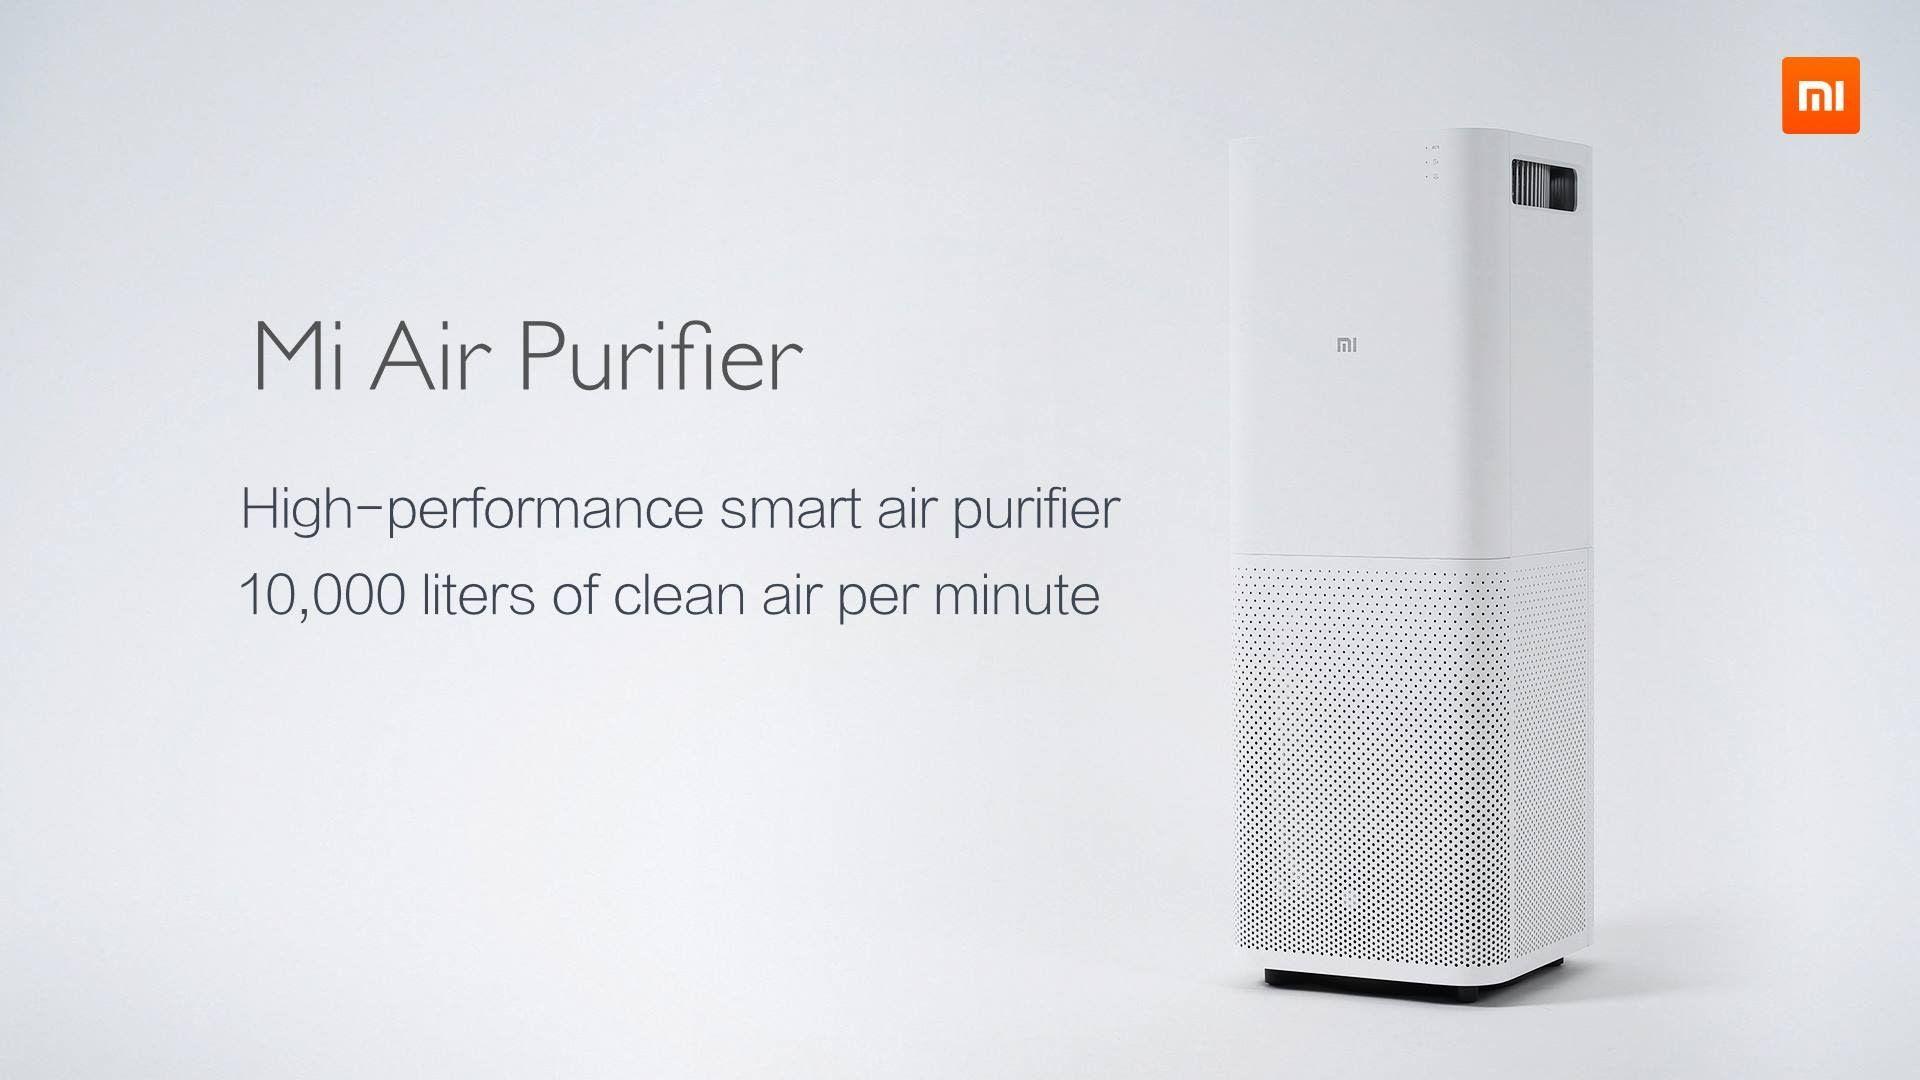 Mi Air Puriifer